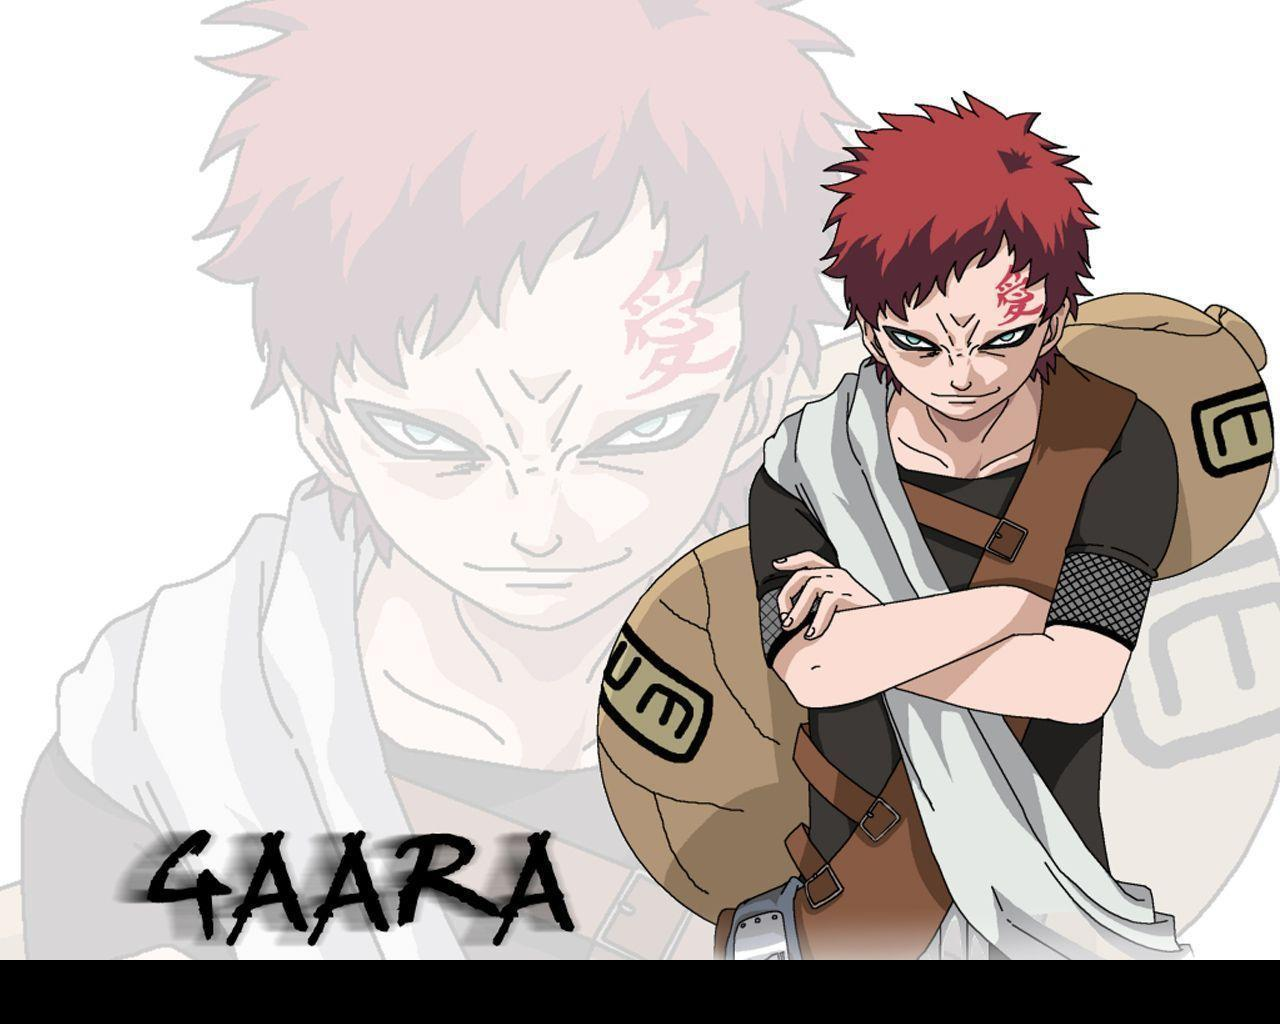 Naruto And Hinata Wallpaper 3d Gaara Wallpapers 3d Wallpaper Cave